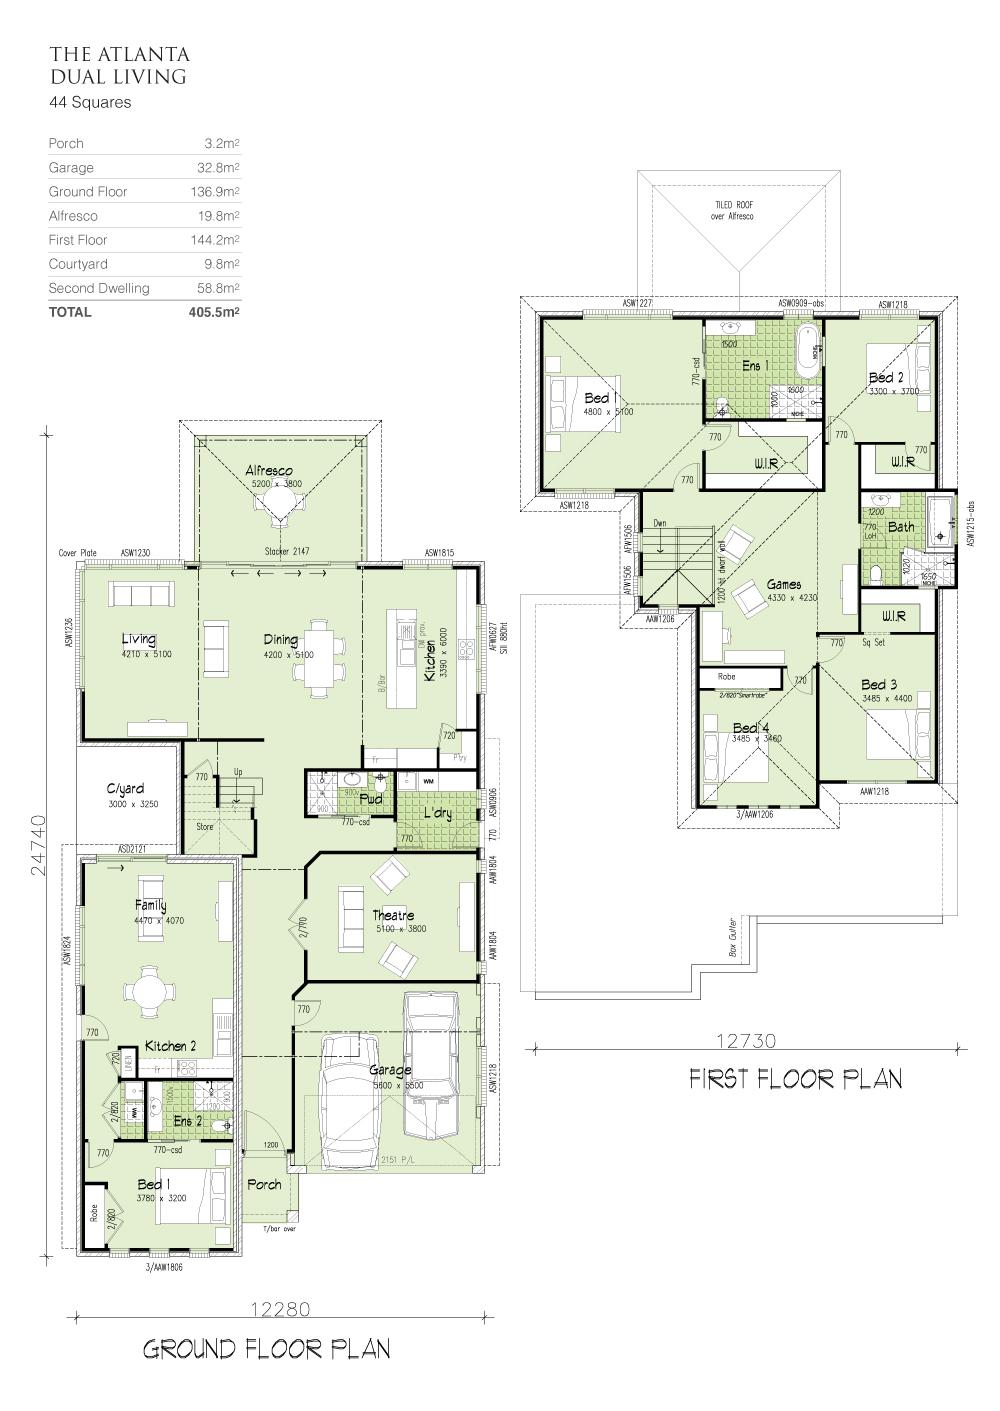 Atlanta MKI Dual Living, Home Design, Tullipan Homes